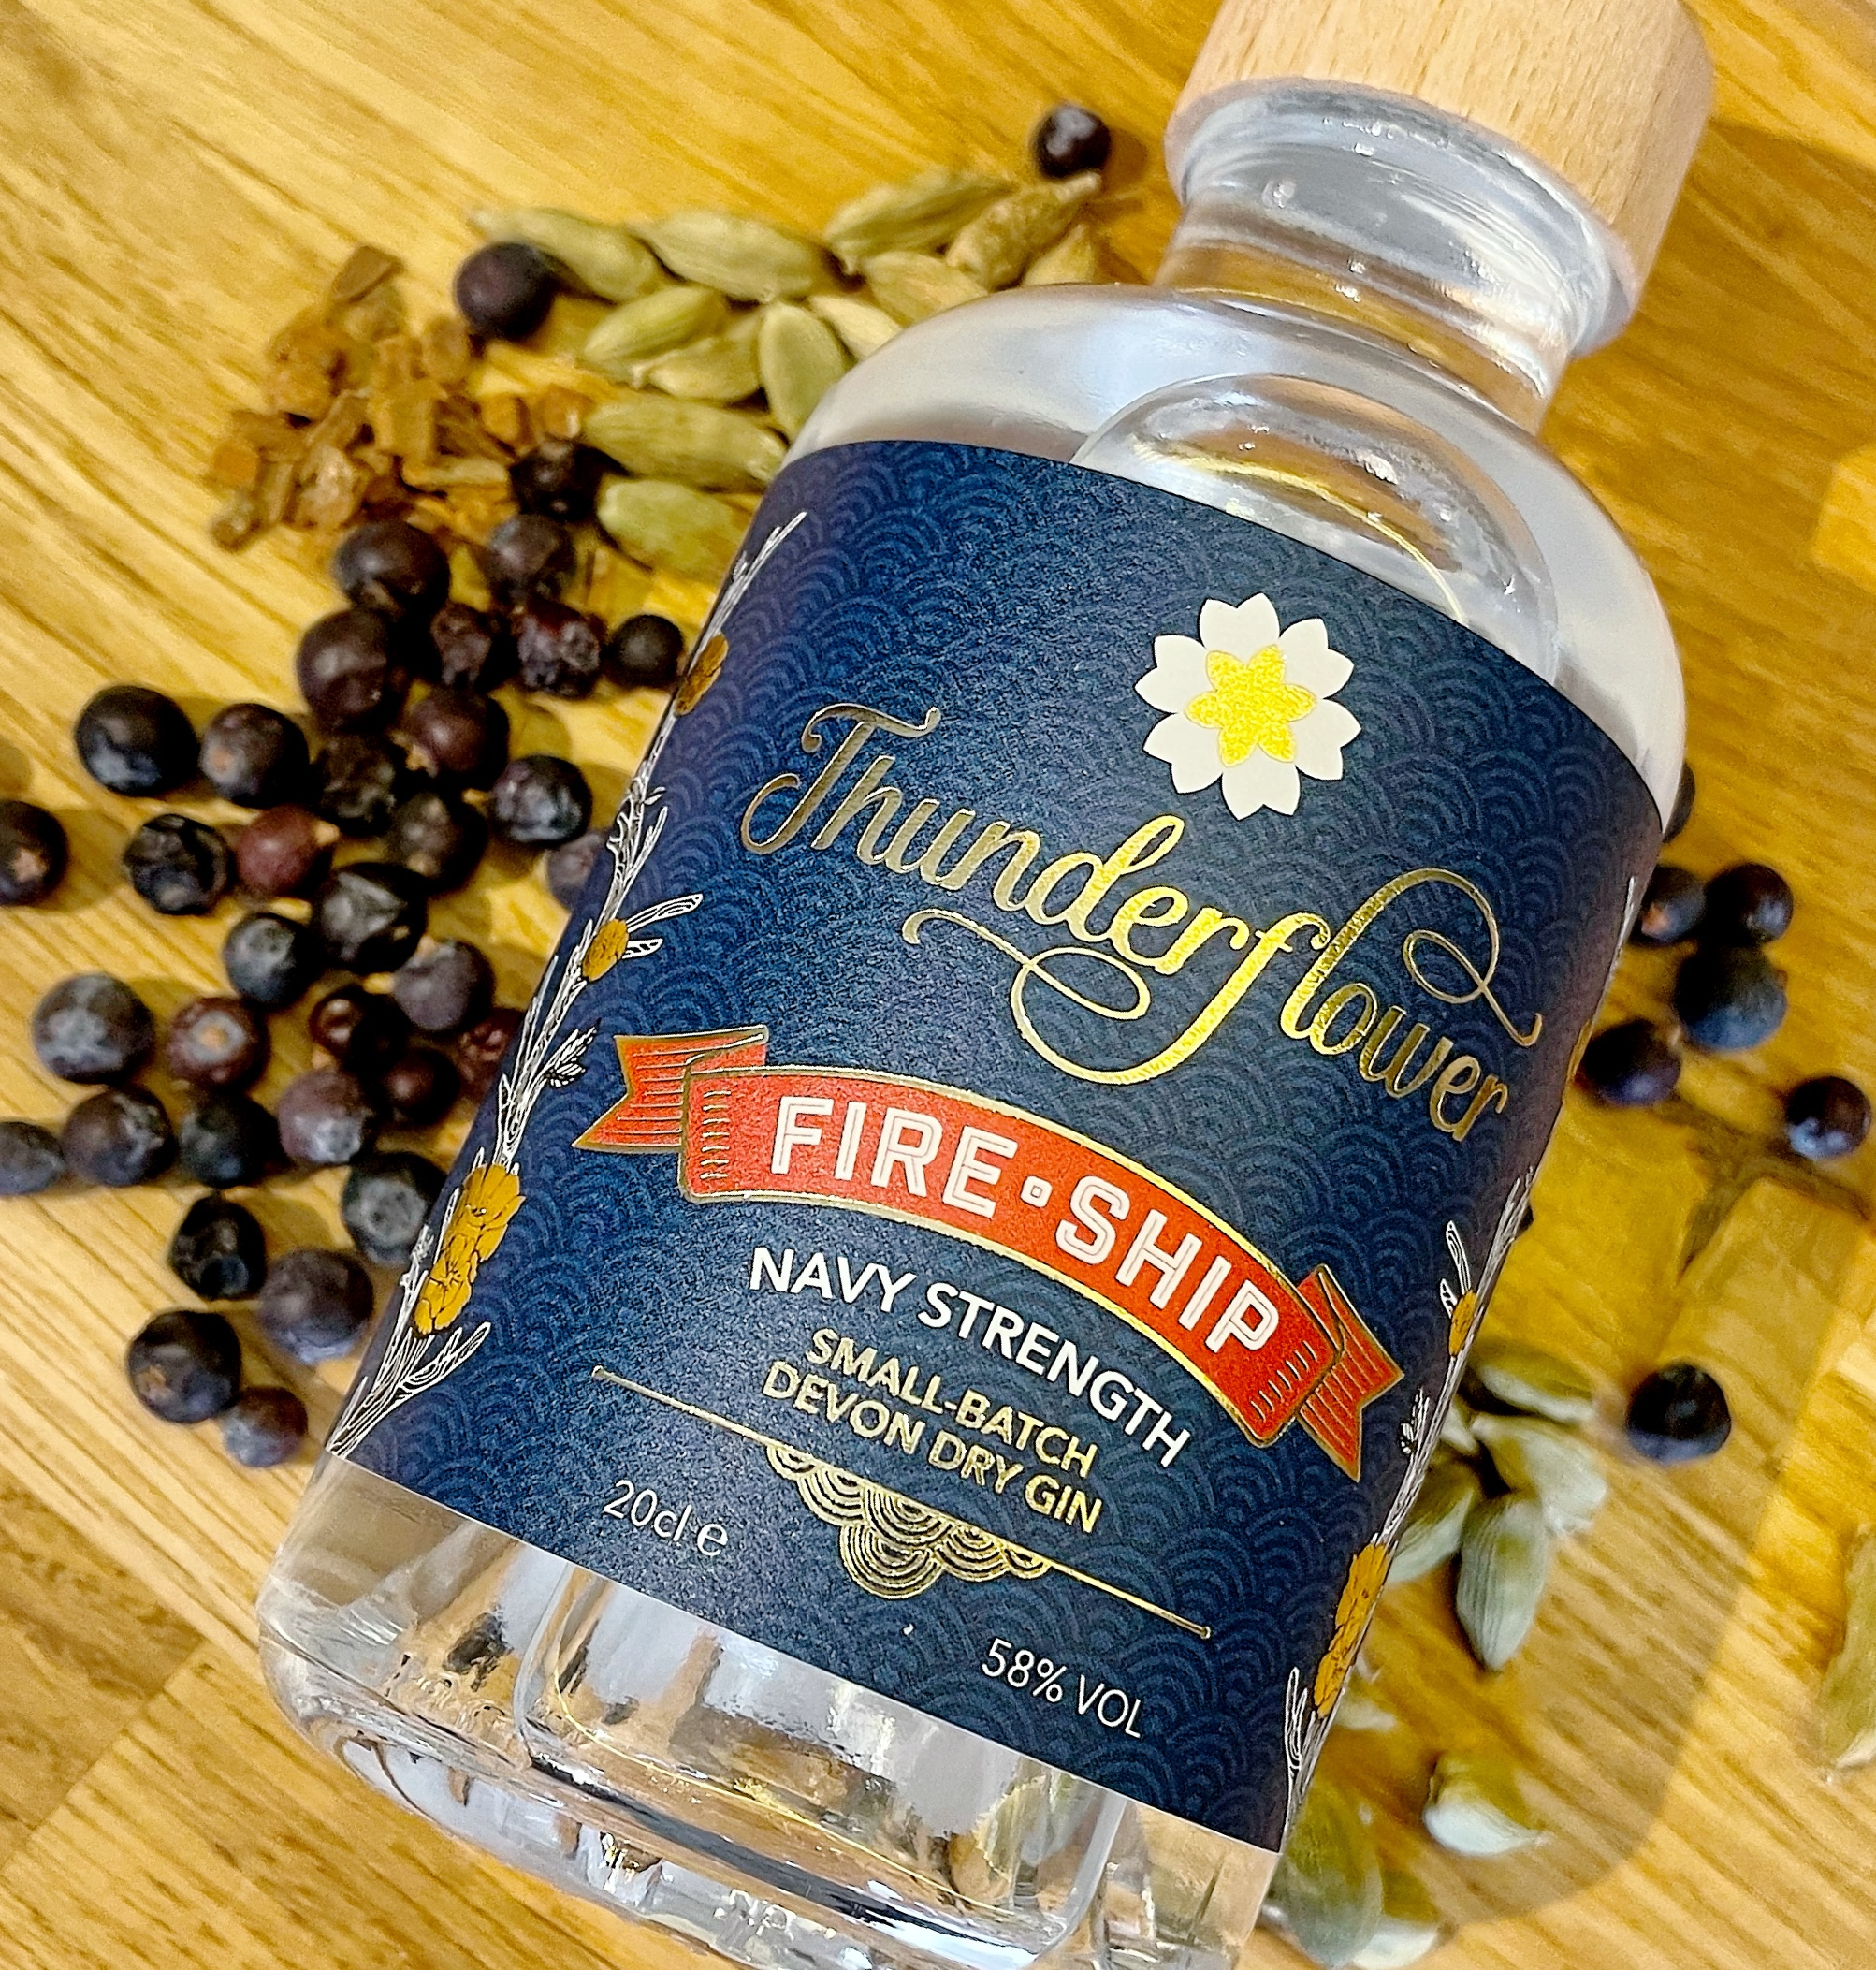 Gin Review – Thunderflower Fire Ship 58